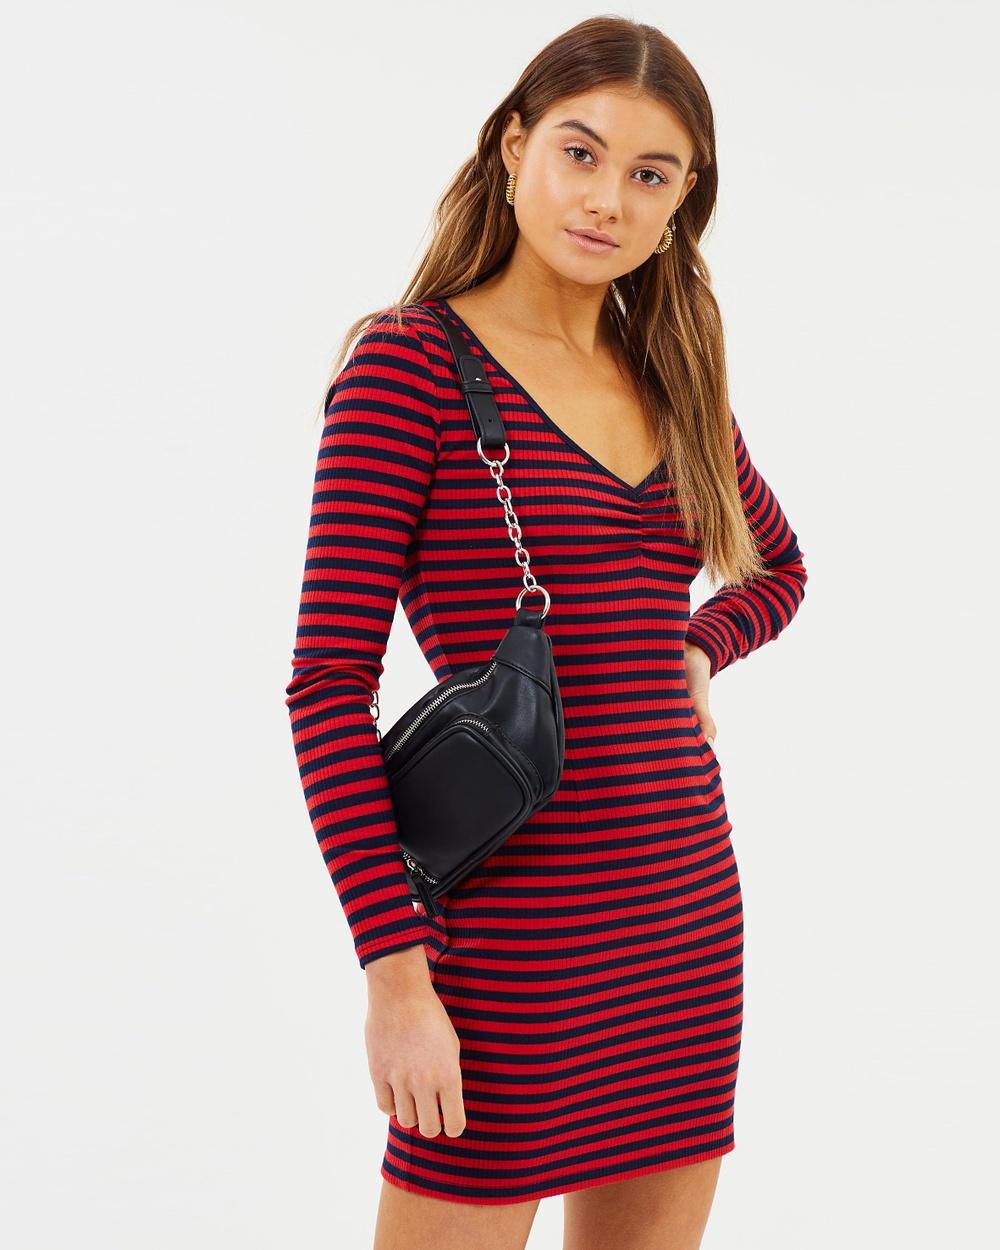 Dazie Chase Cotton Rib Bodycon Dress Bodycon Dresses Red & Navy Chase Cotton Rib Bodycon Dress